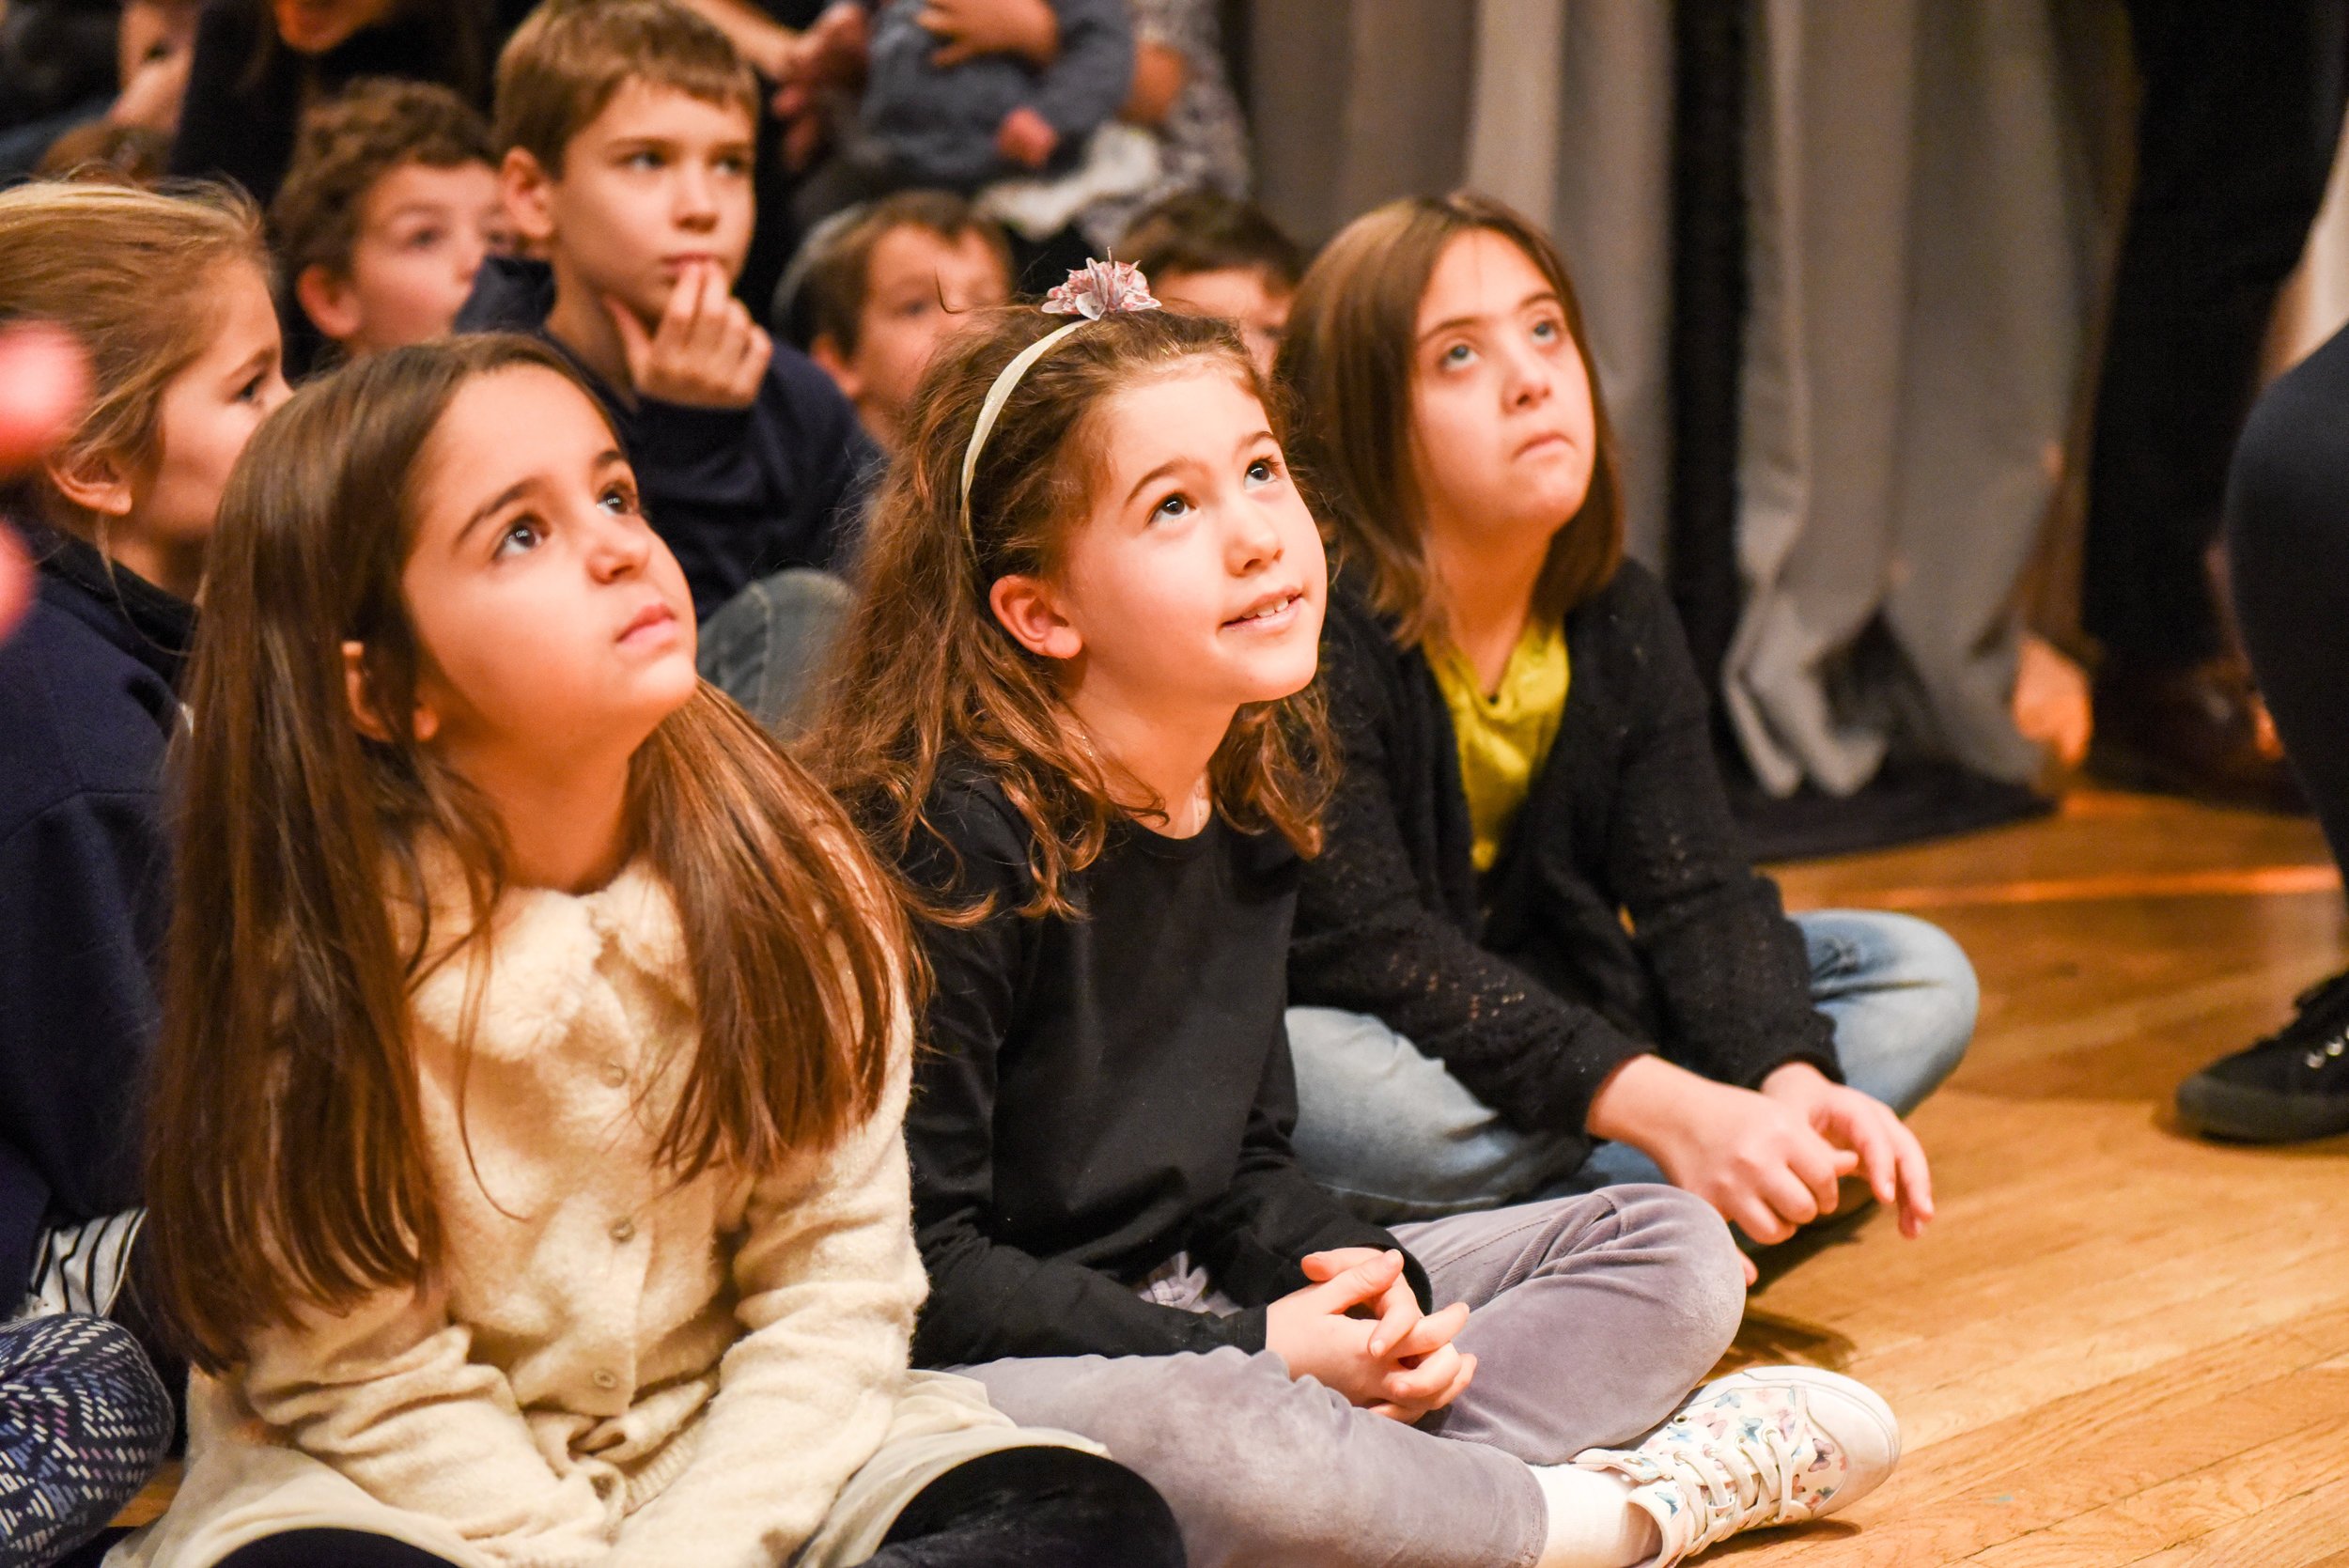 sen-cardinal-patrick-omalley-ofm-cap-archbishop-of-boston-greets-the-children-at-the-encounter_25820836268_o.jpg